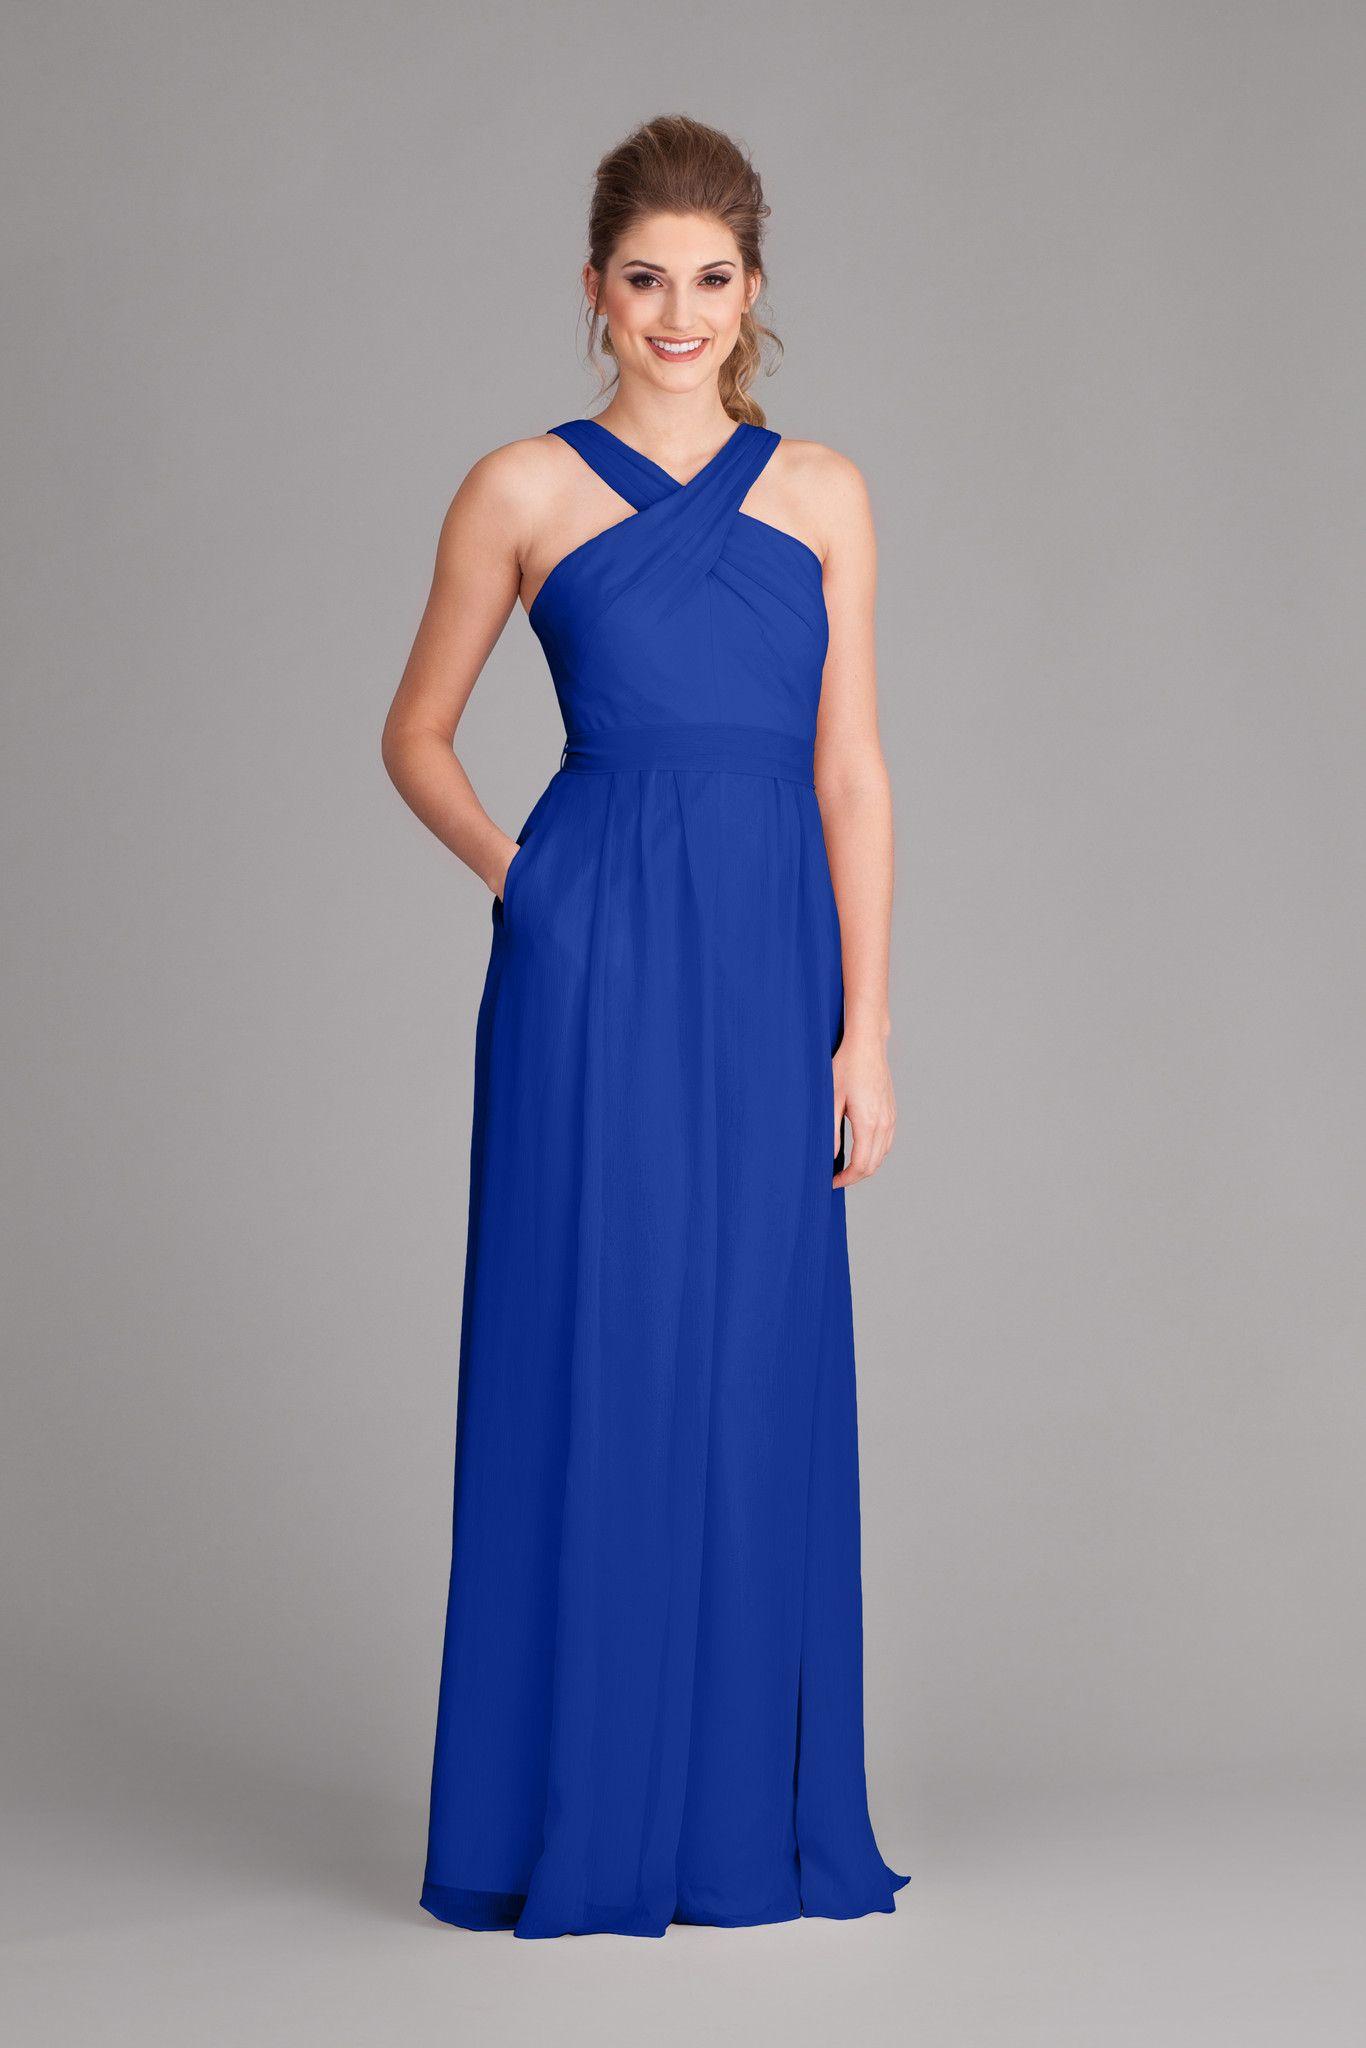 Stella gorgeous dresses pinterest bridesmaid dresses